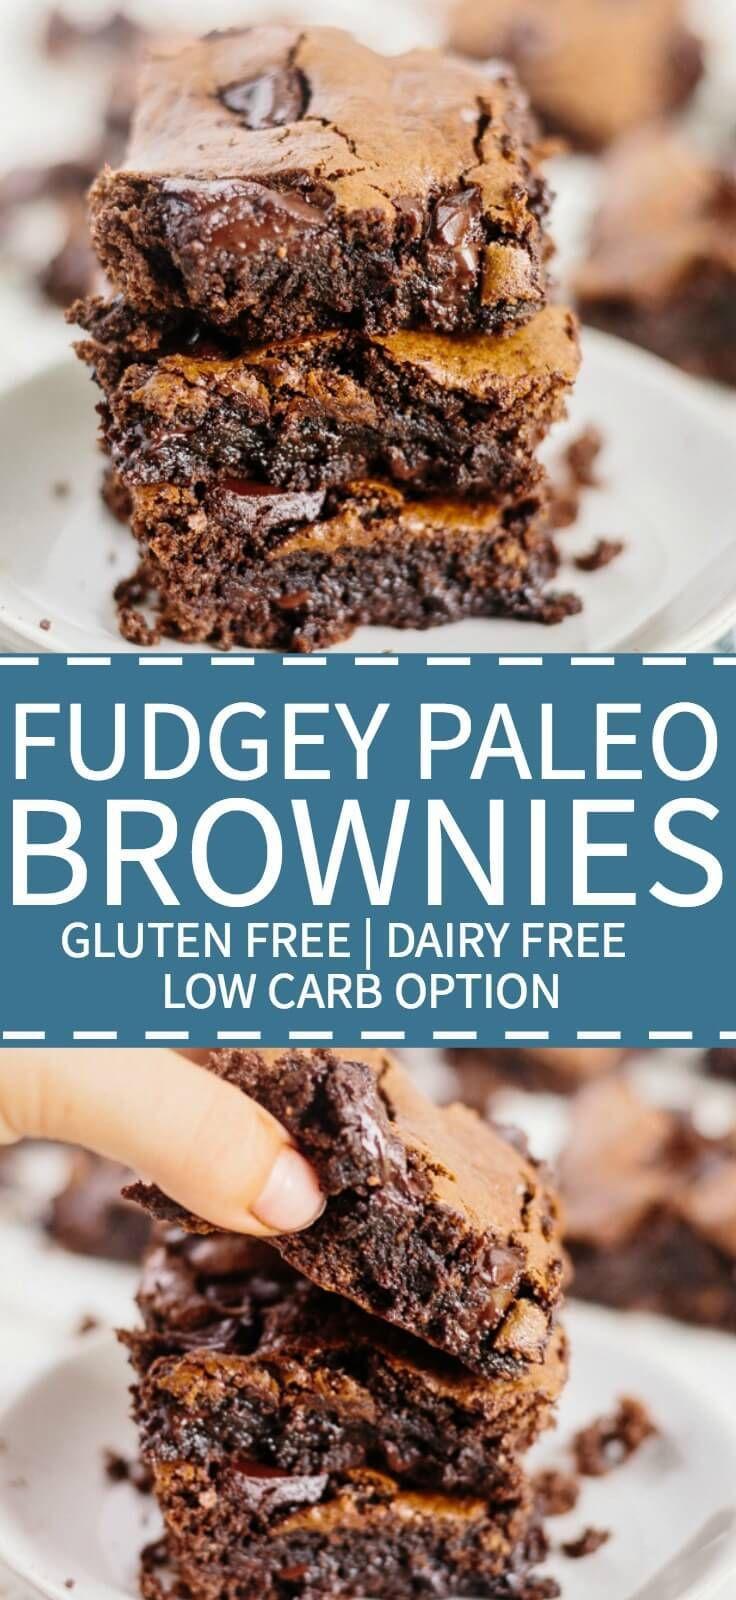 Ultimate Fudgy Paleo Brownies images